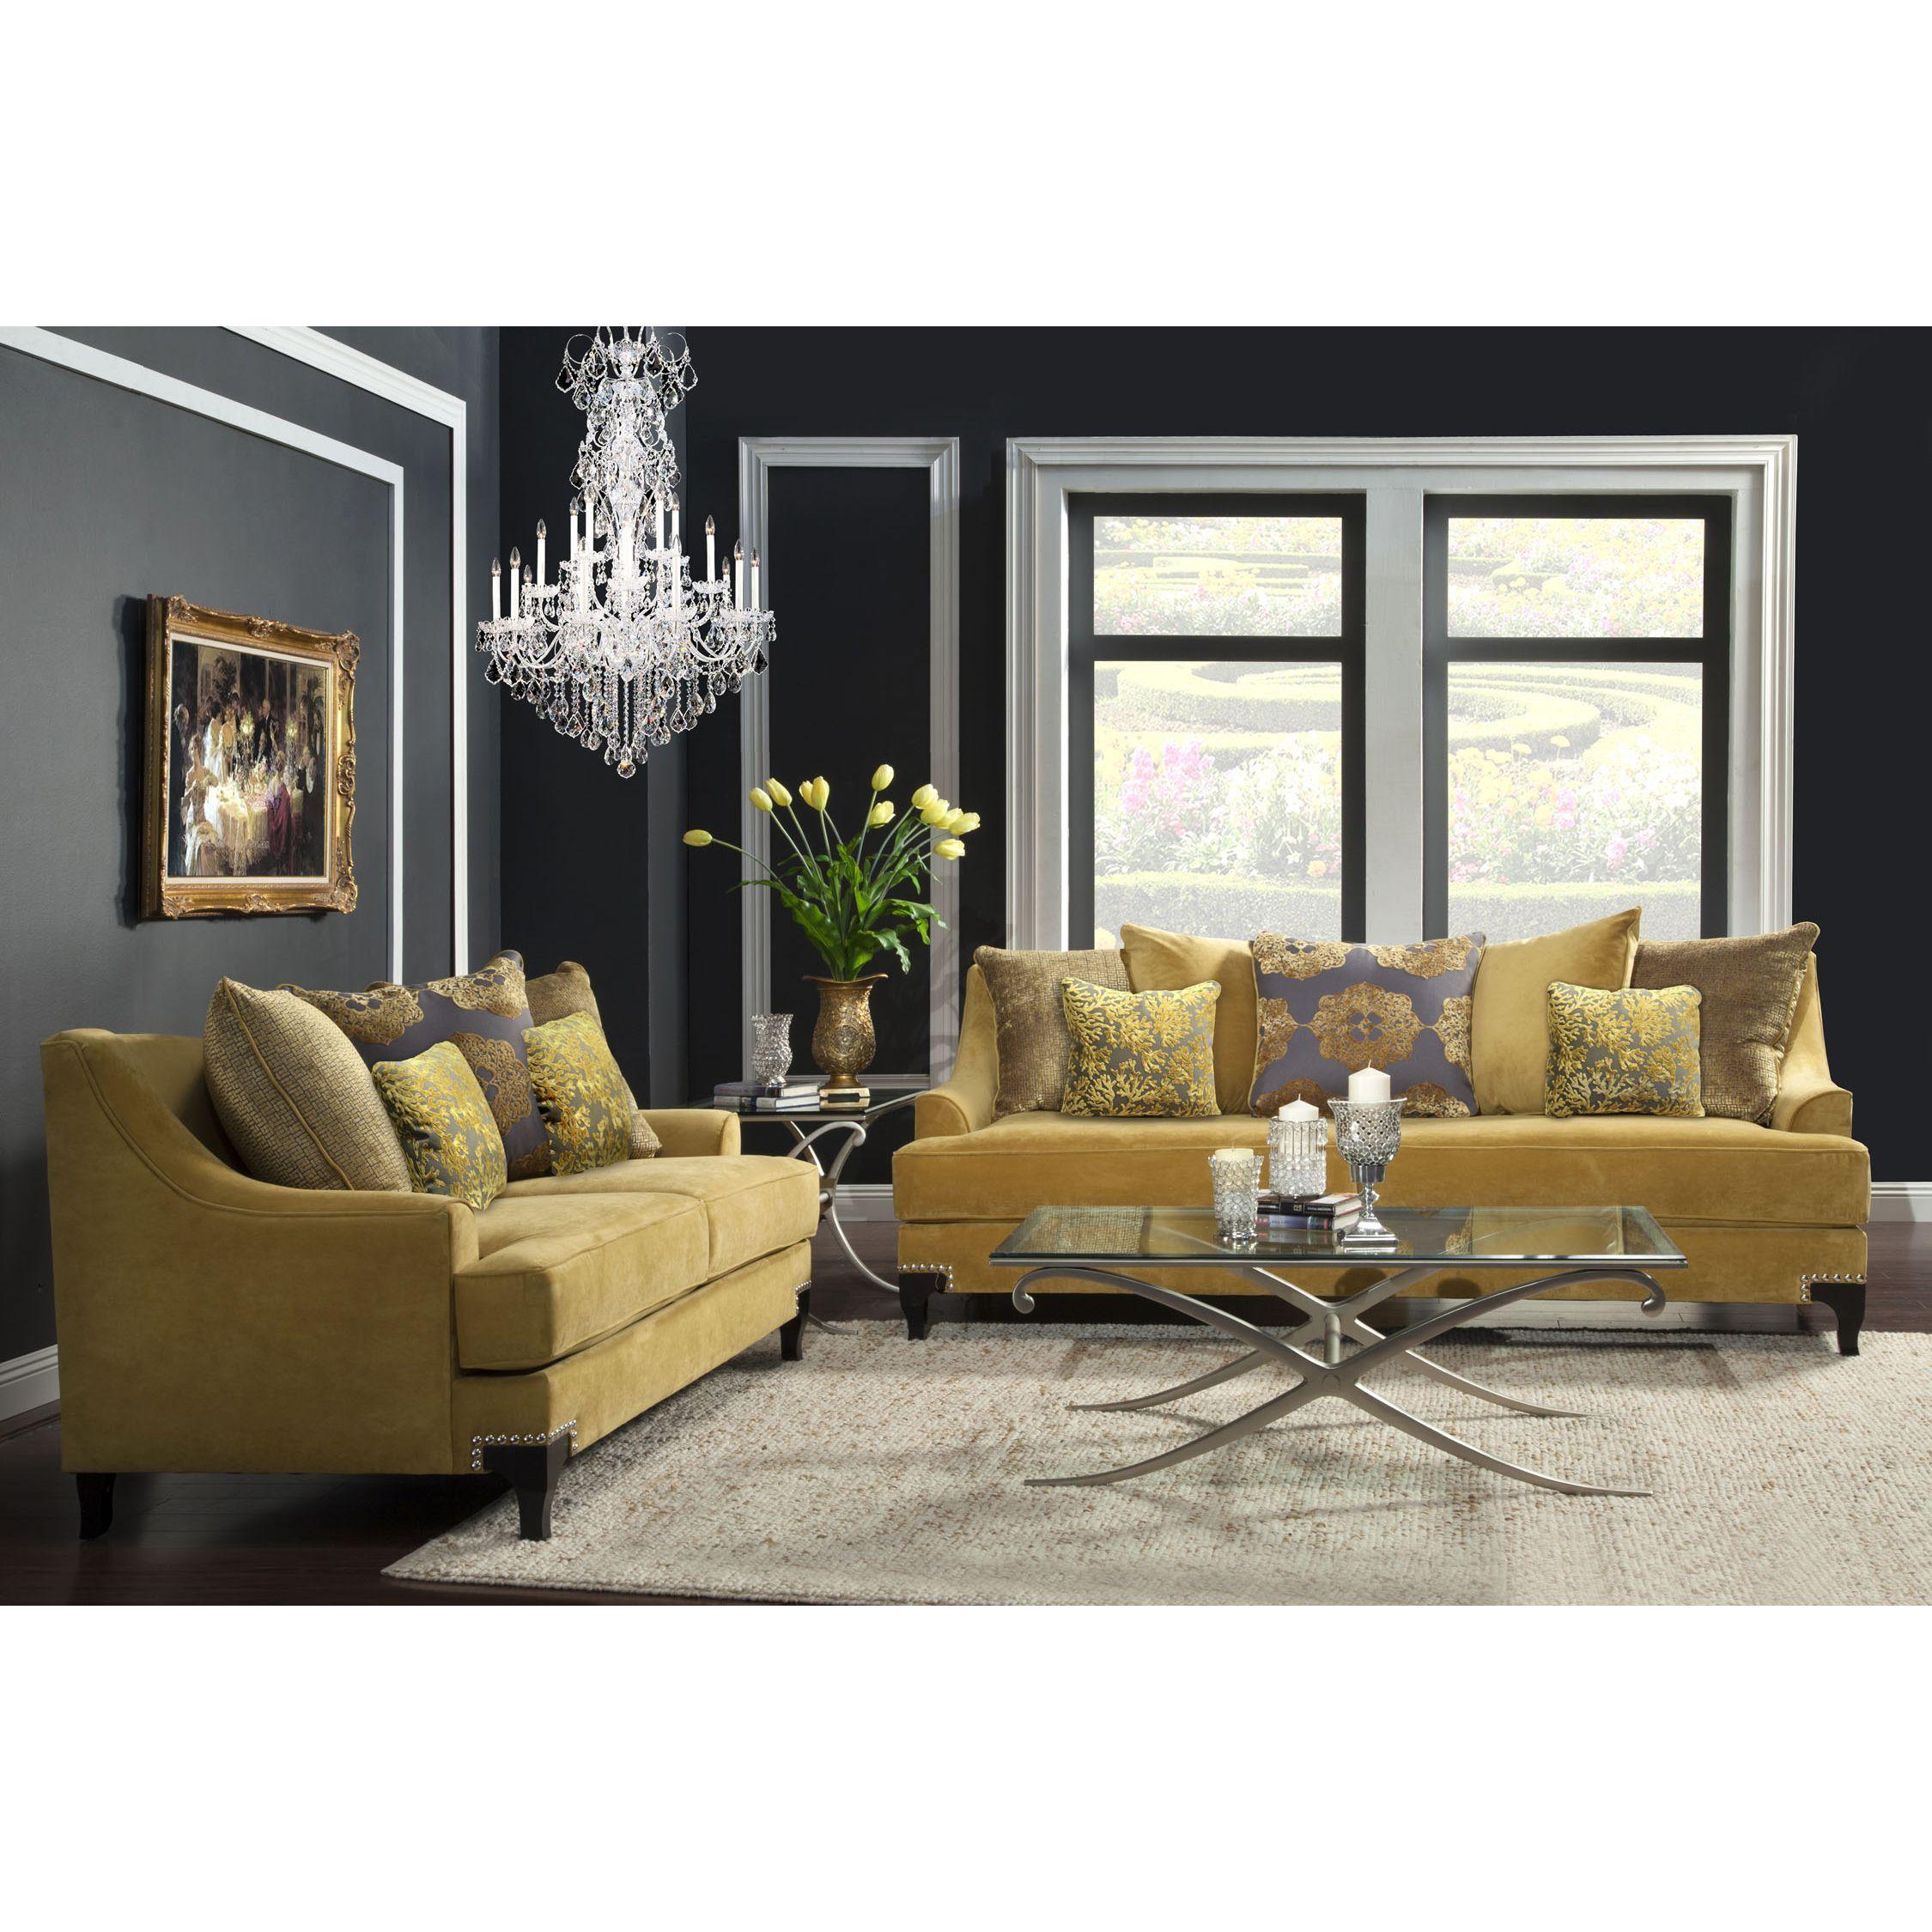 Furniture Of America Visconti Premium Fabric Loveseat   Overstock.com  Shopping   The Best Deals